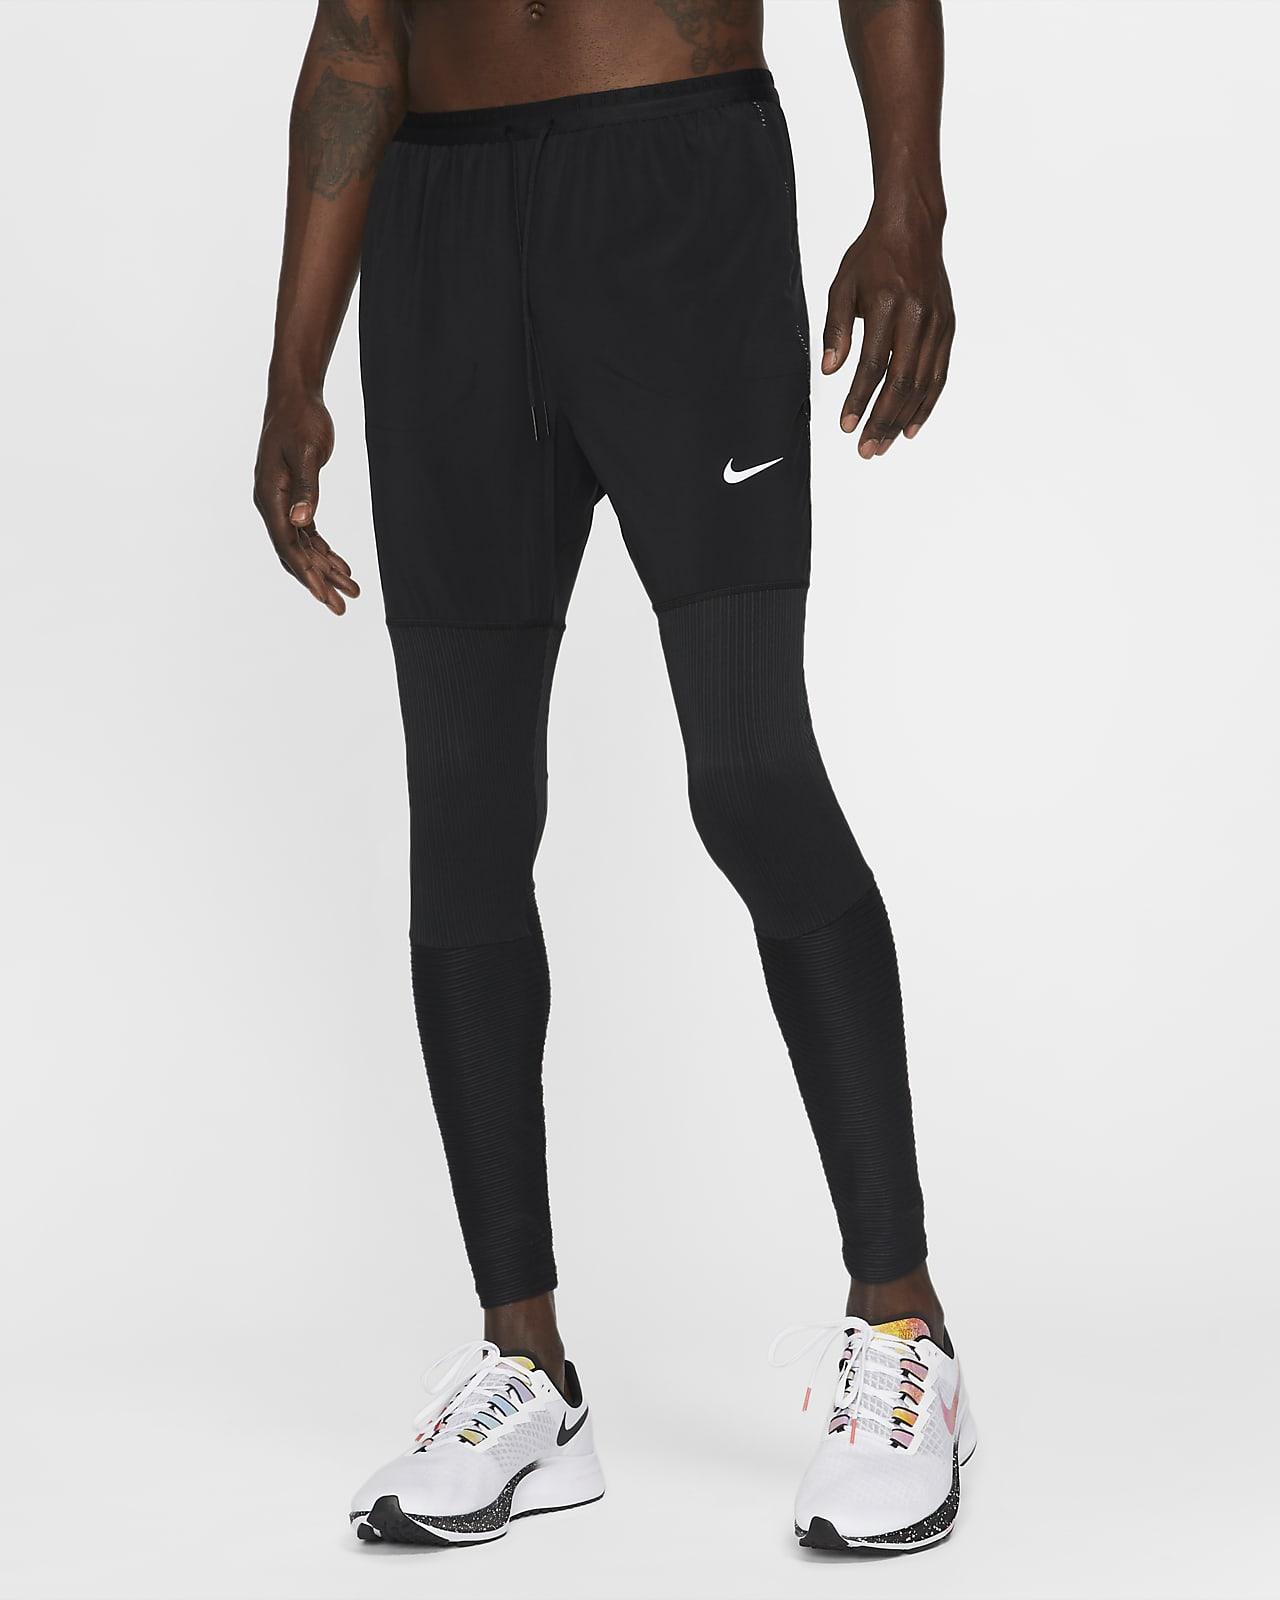 Pantalones largos híbridos de running para hombre Nike Dri-FIT Phenom Run Division